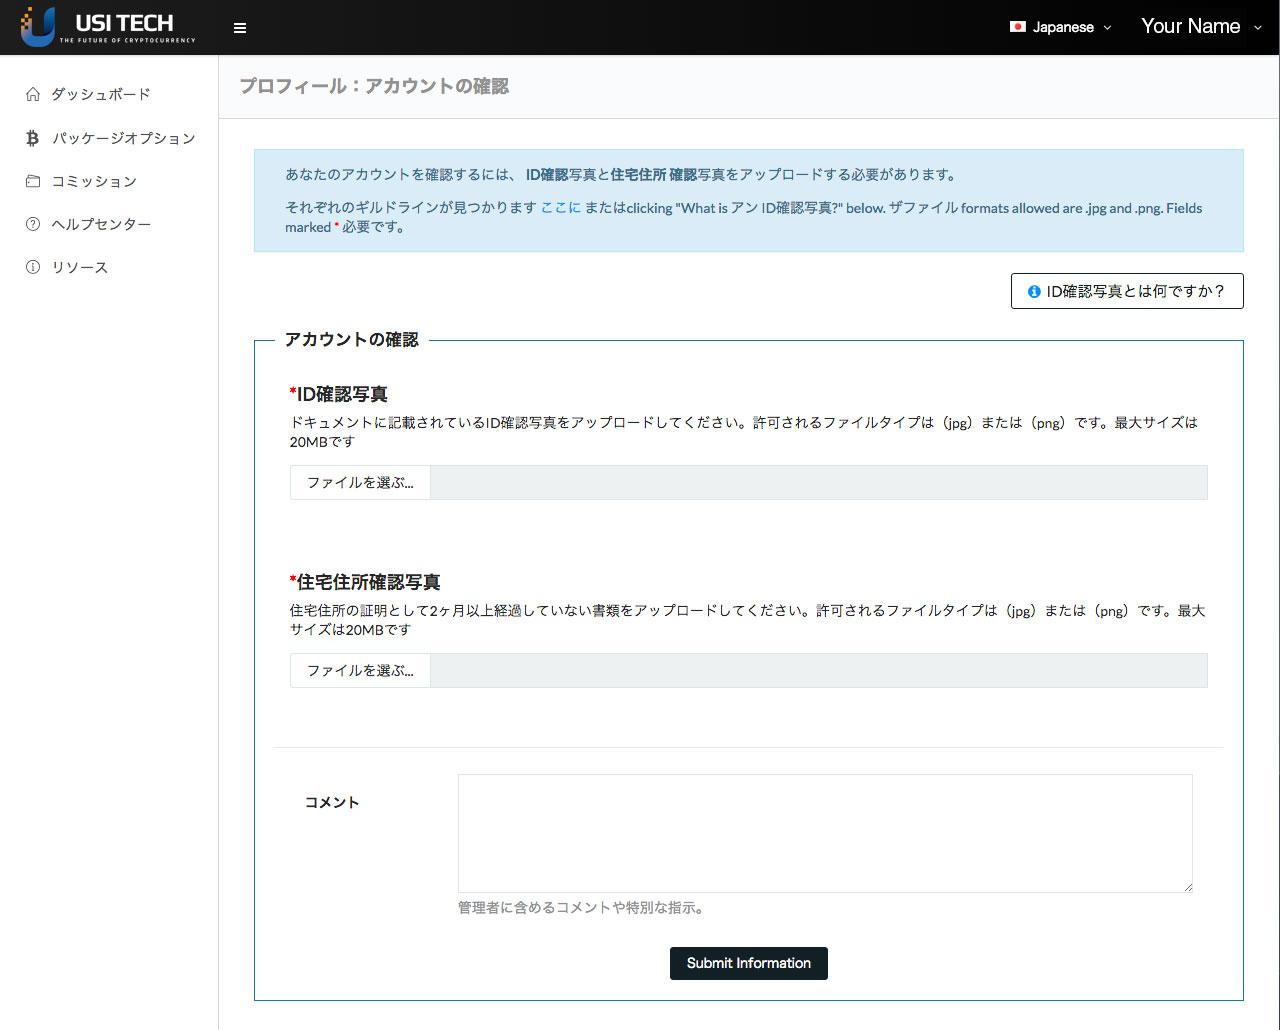 USI-TECH ID確認写真のアップロード画面